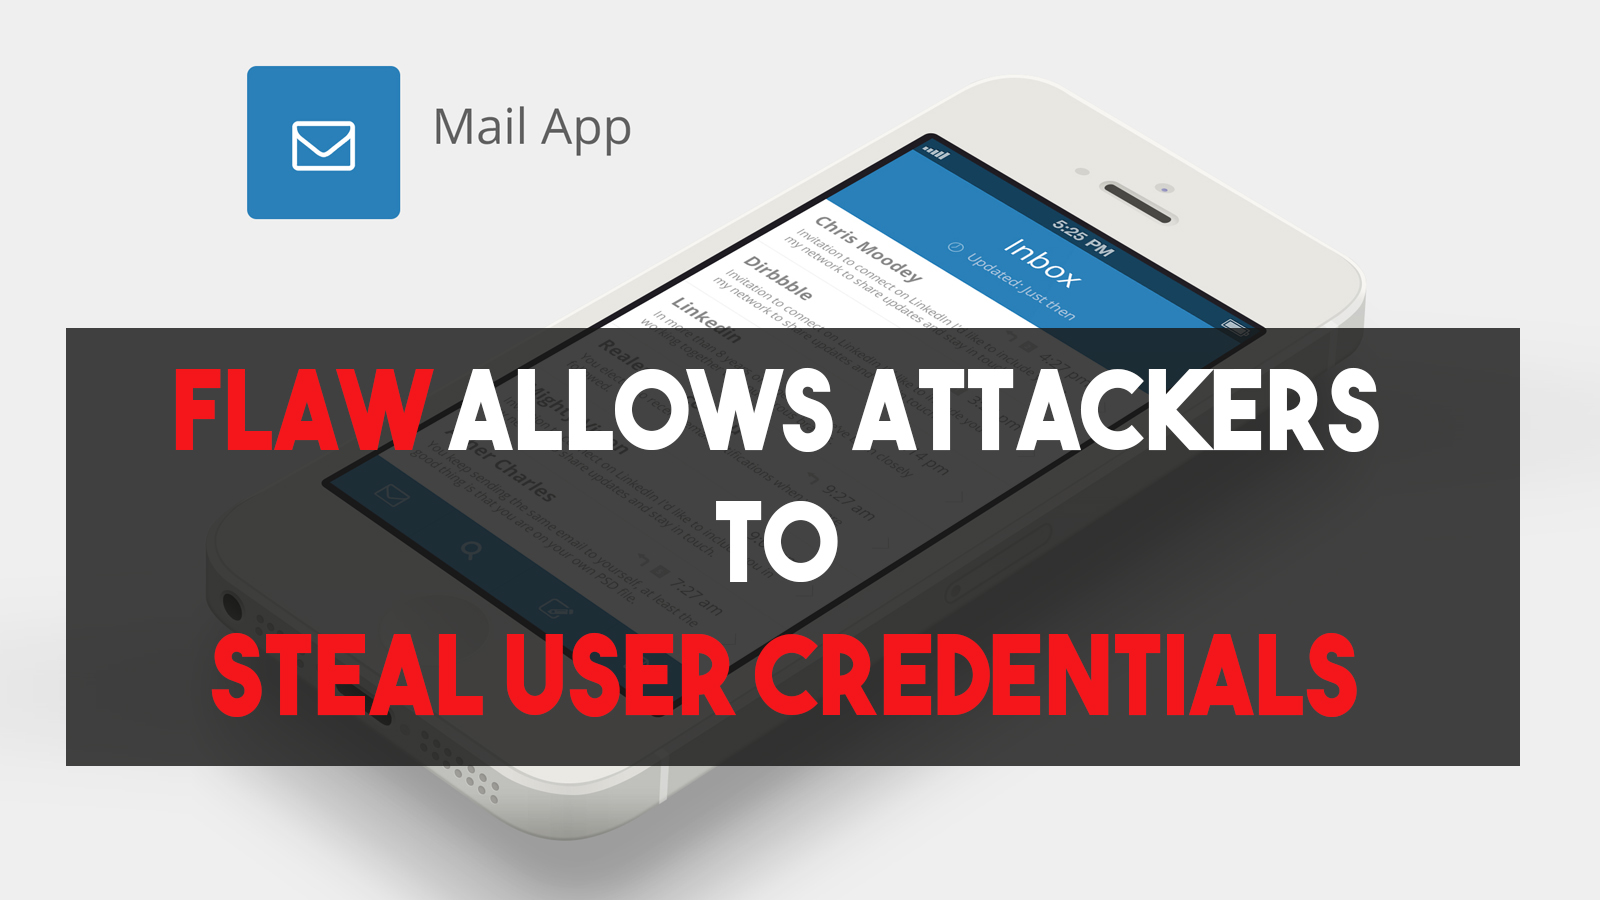 ios mail app flaw